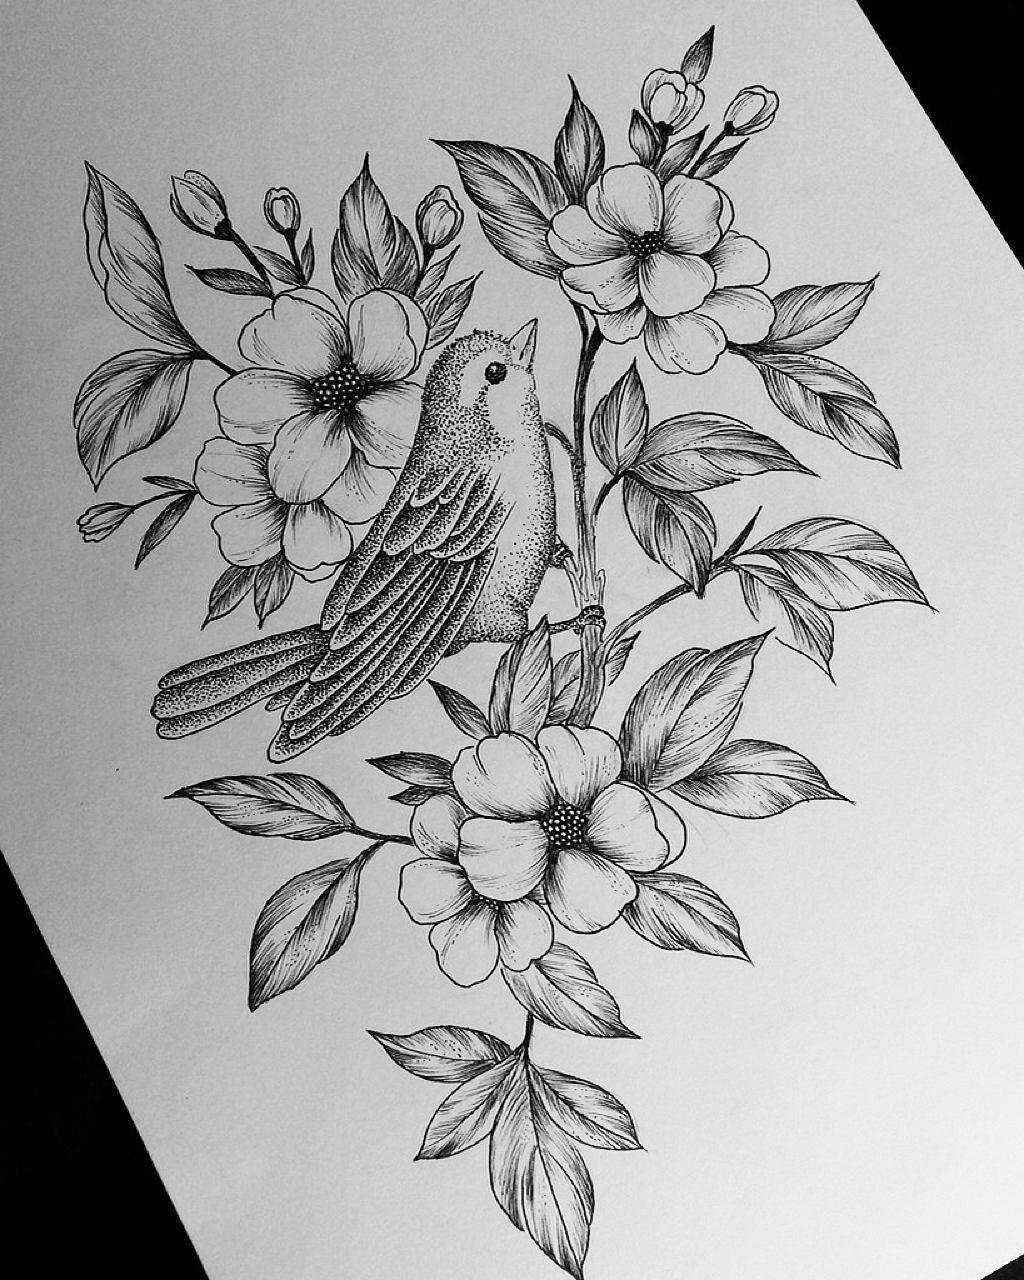 Yarina Chaplinskaya Darumaworkshop Zen Drawing Art Artwork Blackart Blackwork Blackworker Blackworkartist Blacka Bird Drawings Birds Tattoo Drawings